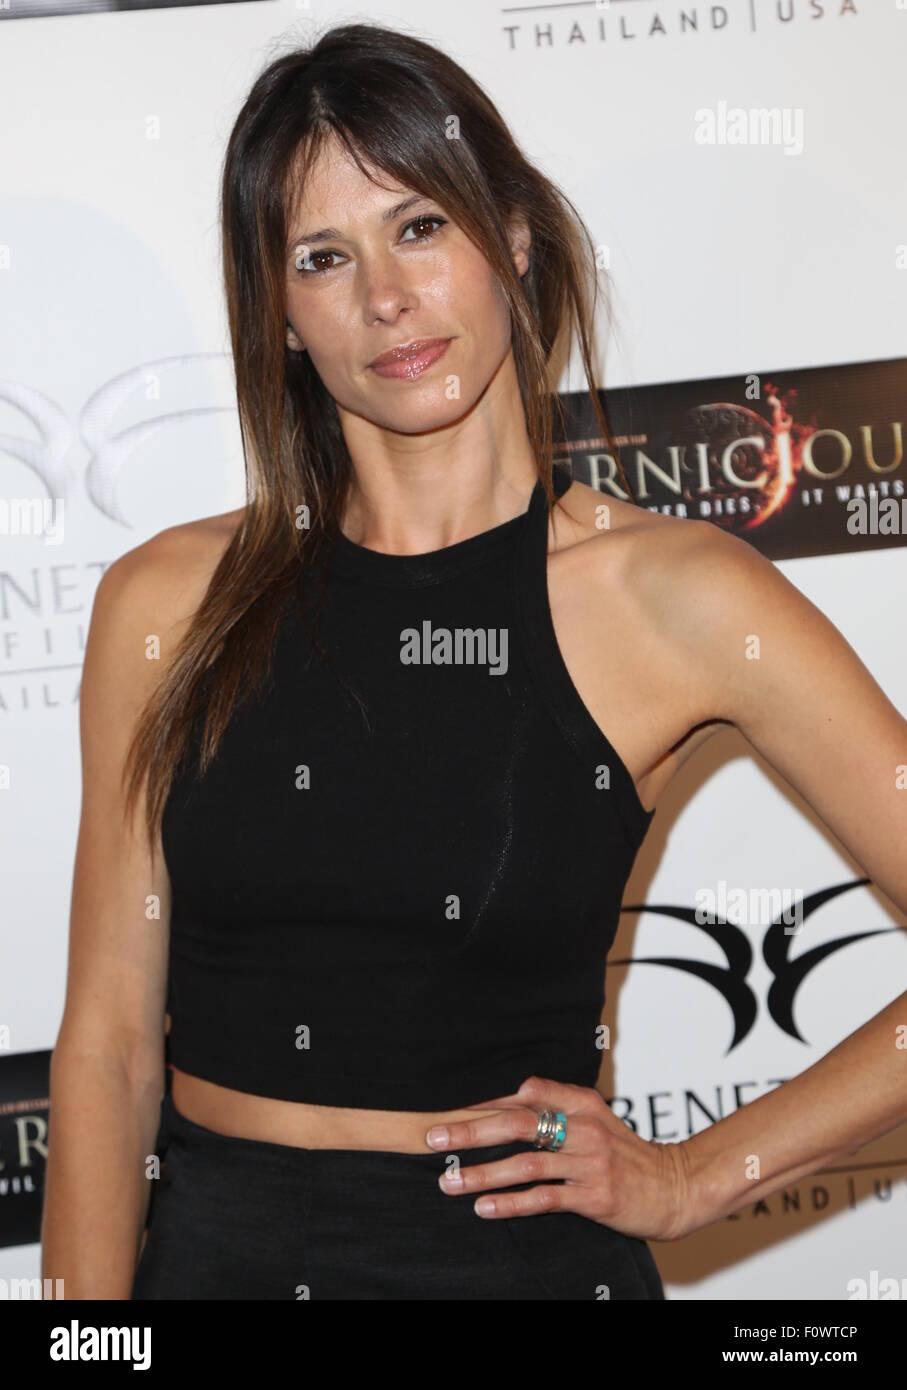 Angela Gots pernicious' premiere held at arena cinemas hollywood